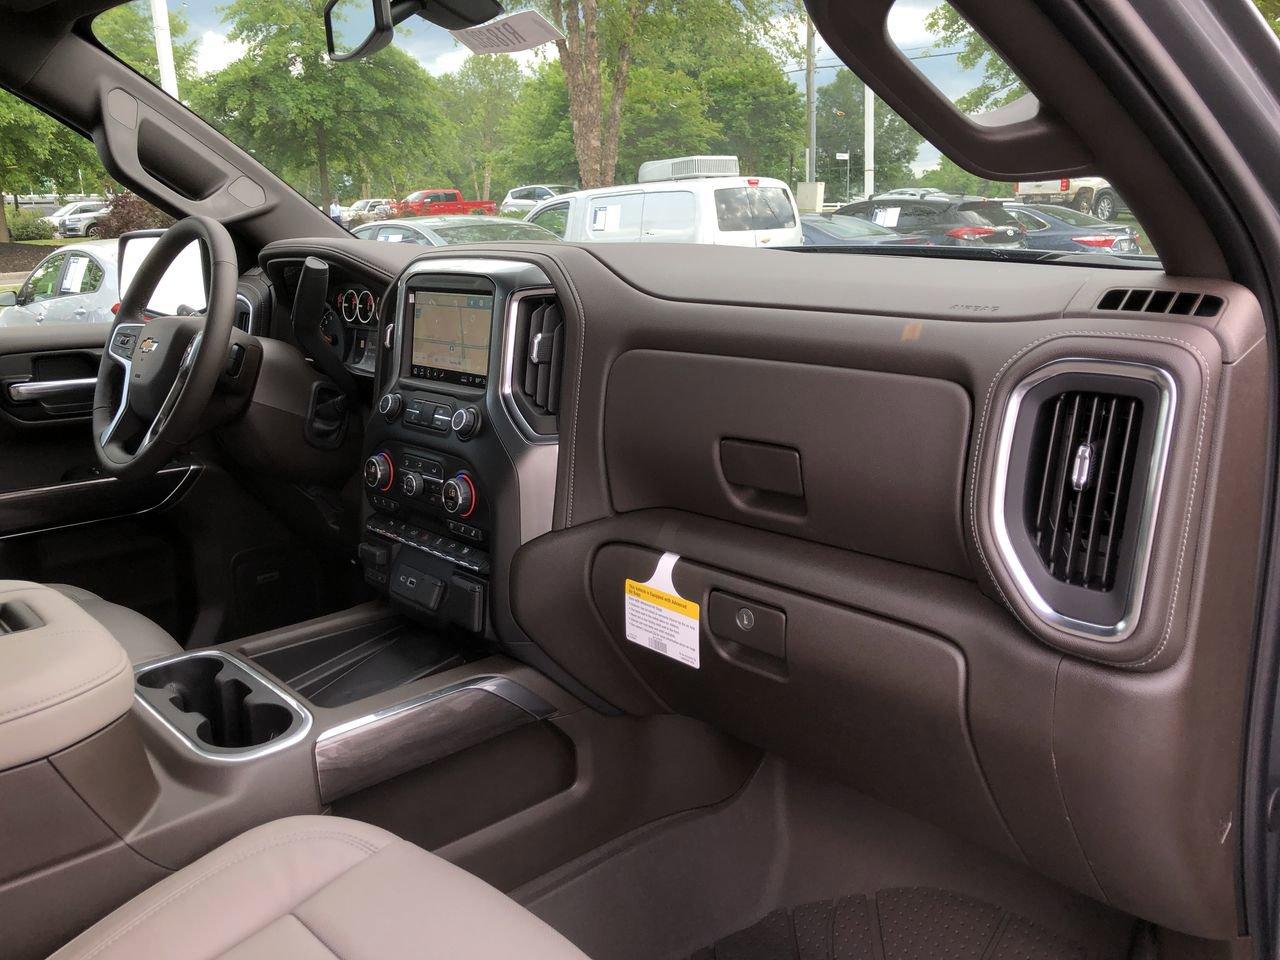 New 2019 Chevrolet Silverado 1500 LTZ